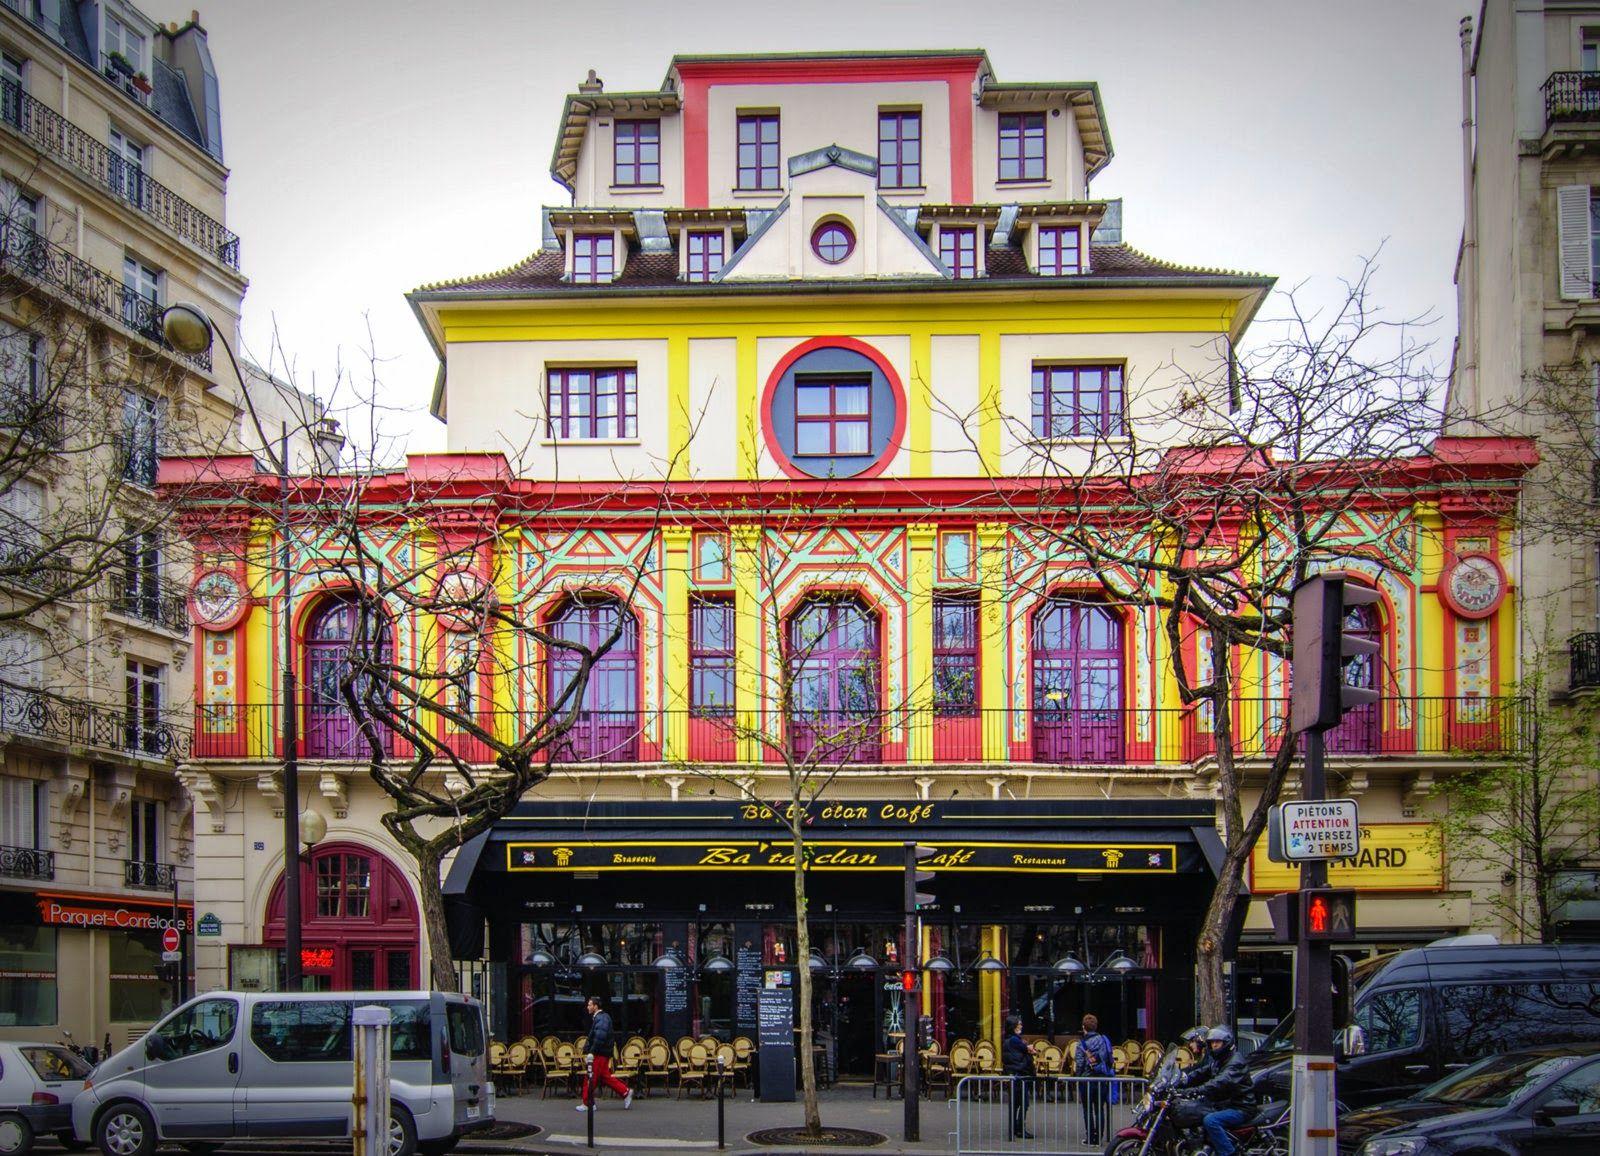 La facciata del Bataclan in Boulevard Voltaire a Parigi